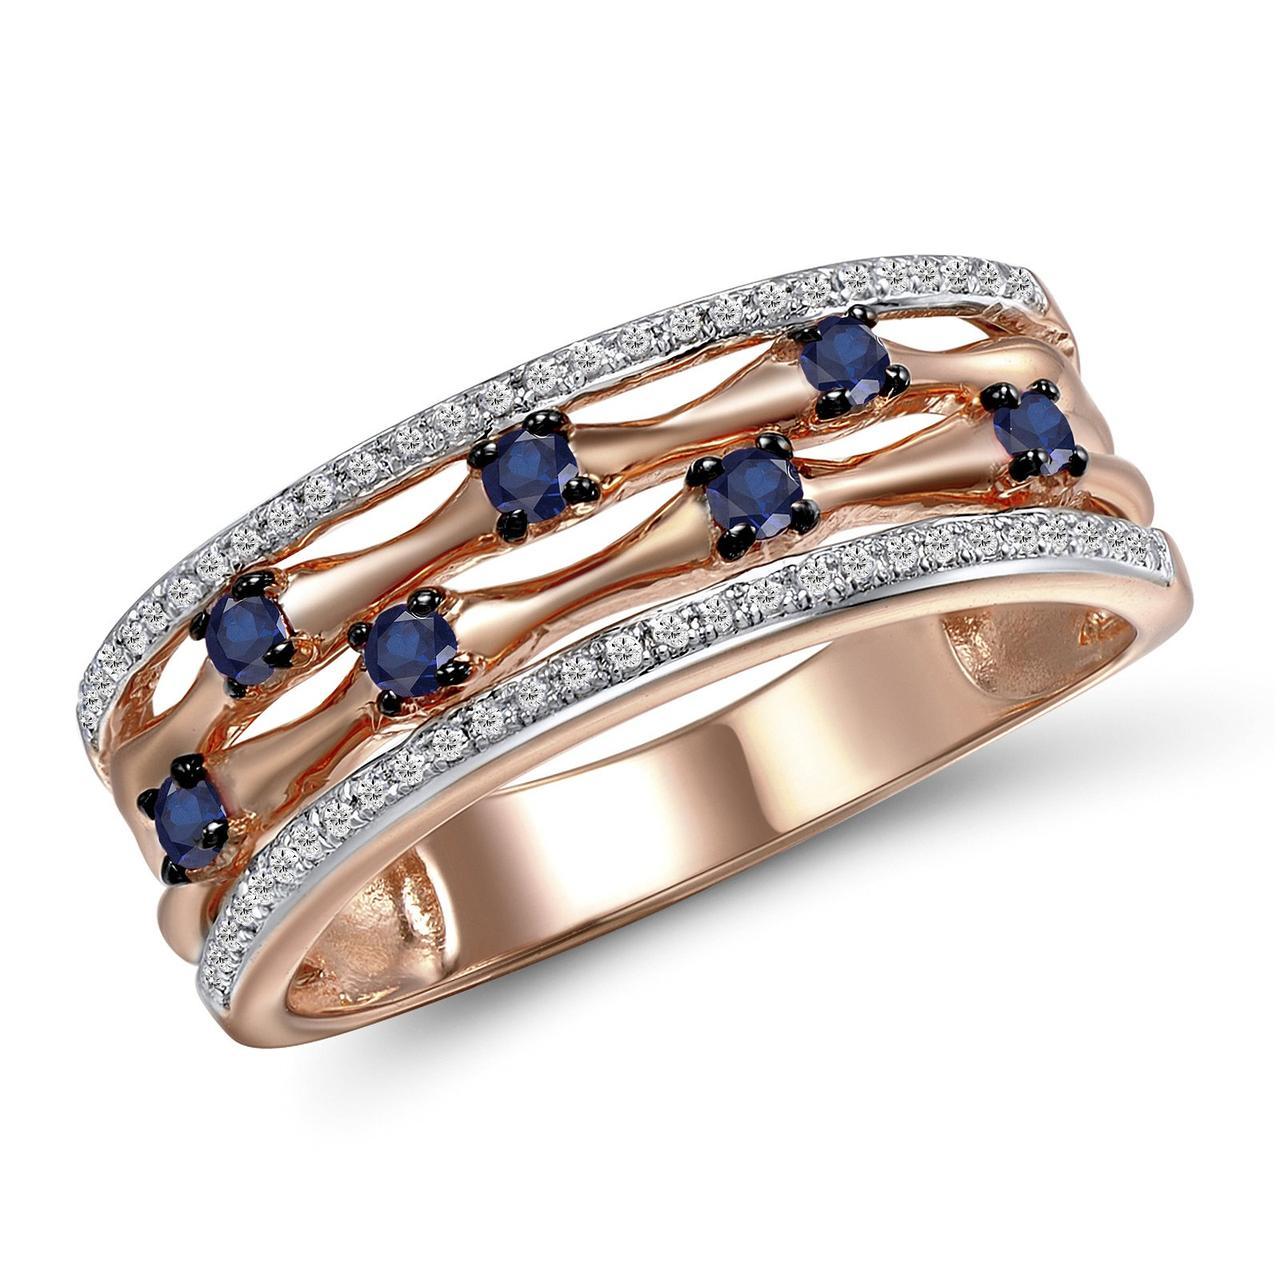 Золотое кольцо с бриллиантами и сапфирами, размер 16.5 (1687066)